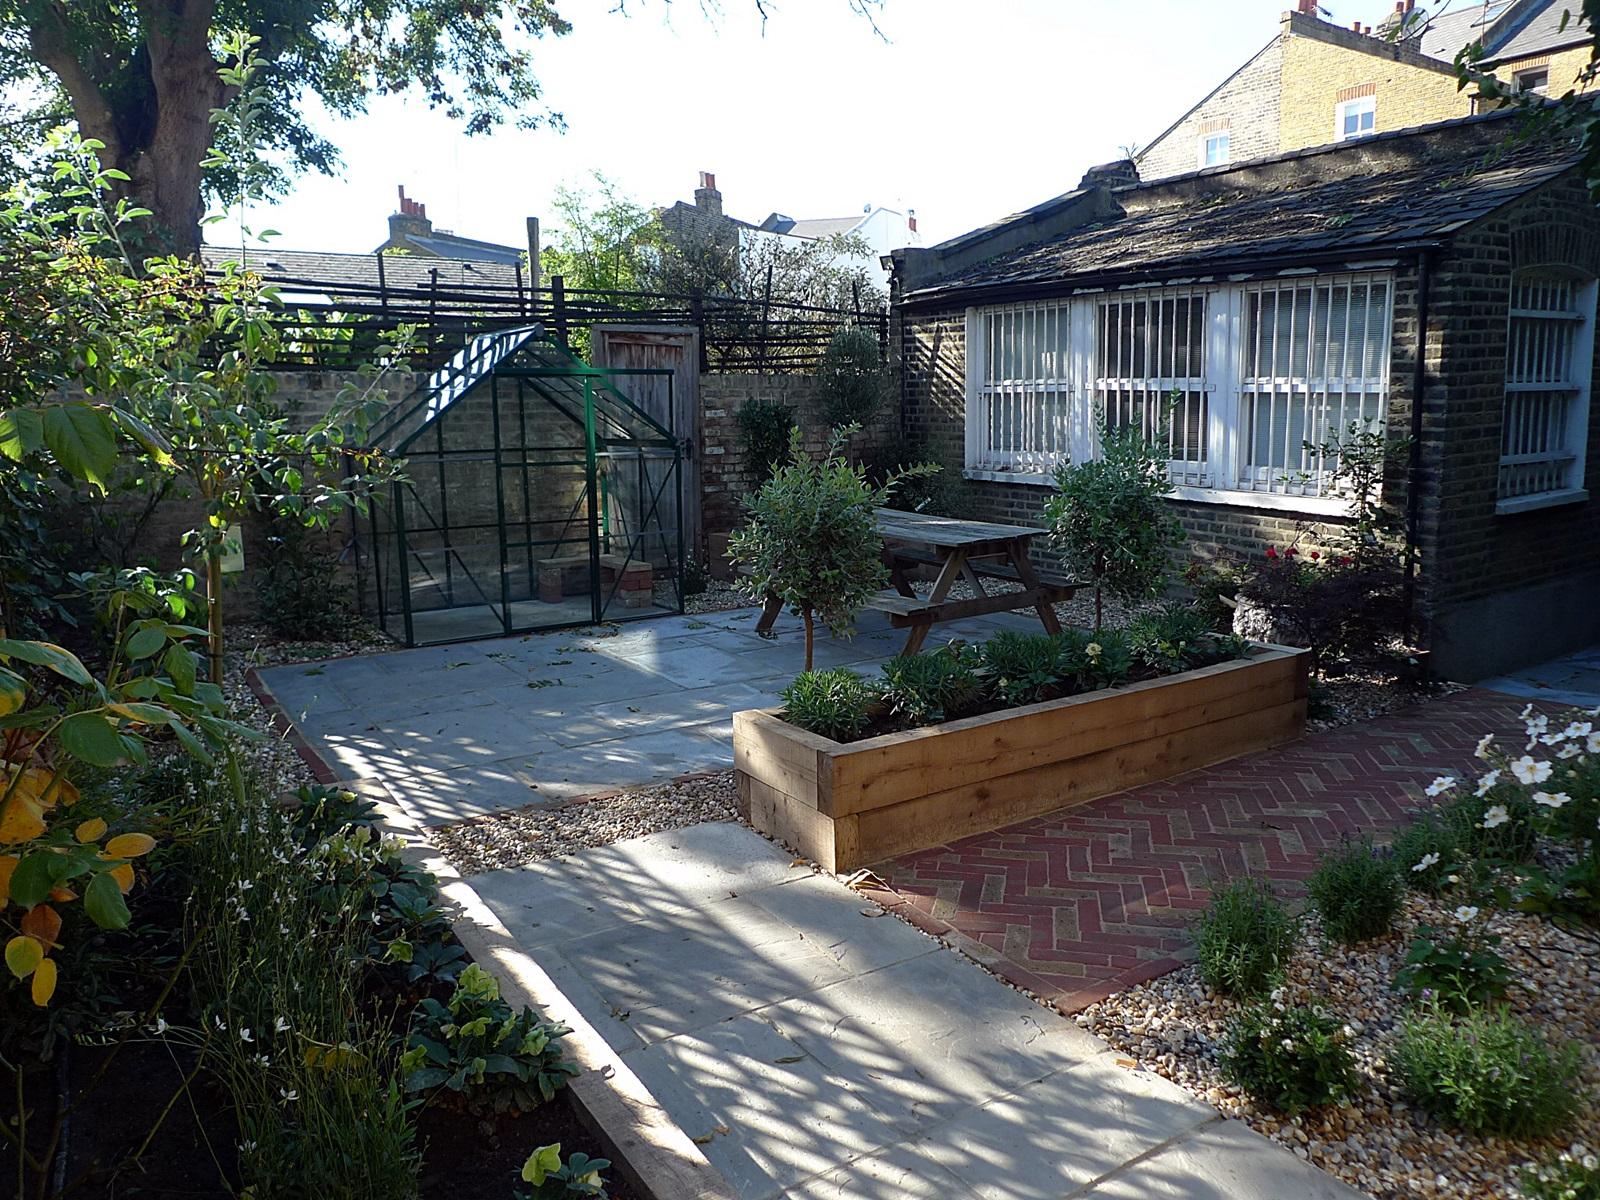 victorian style garden clapham old town garden design oak sleepers herring bone brick path sandstone paving london dulwich battersea